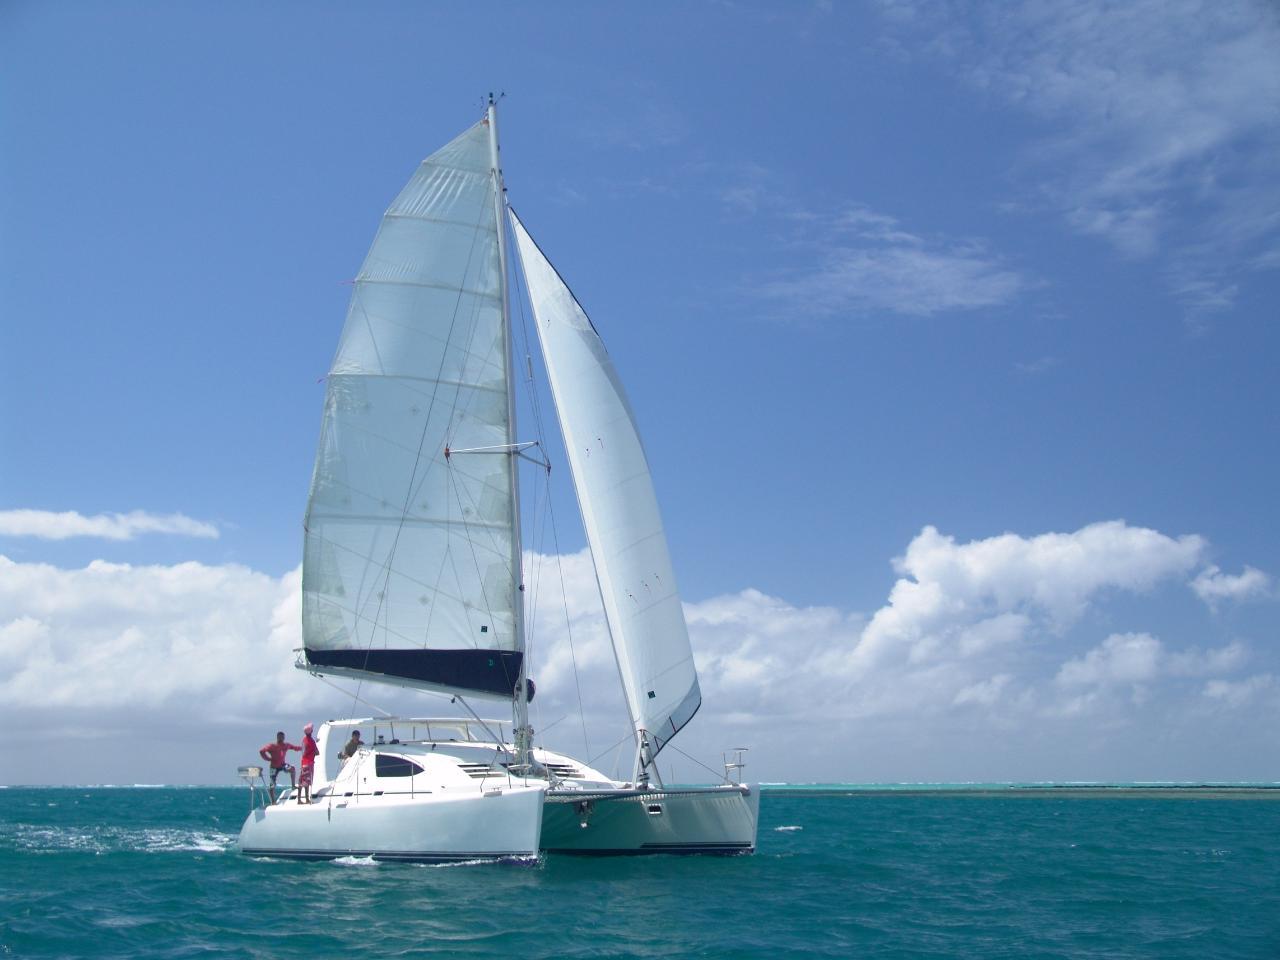 Resident Rates 2021/22 - Fun Full Day Cruise - Blue Alizé (Sharing Basis)